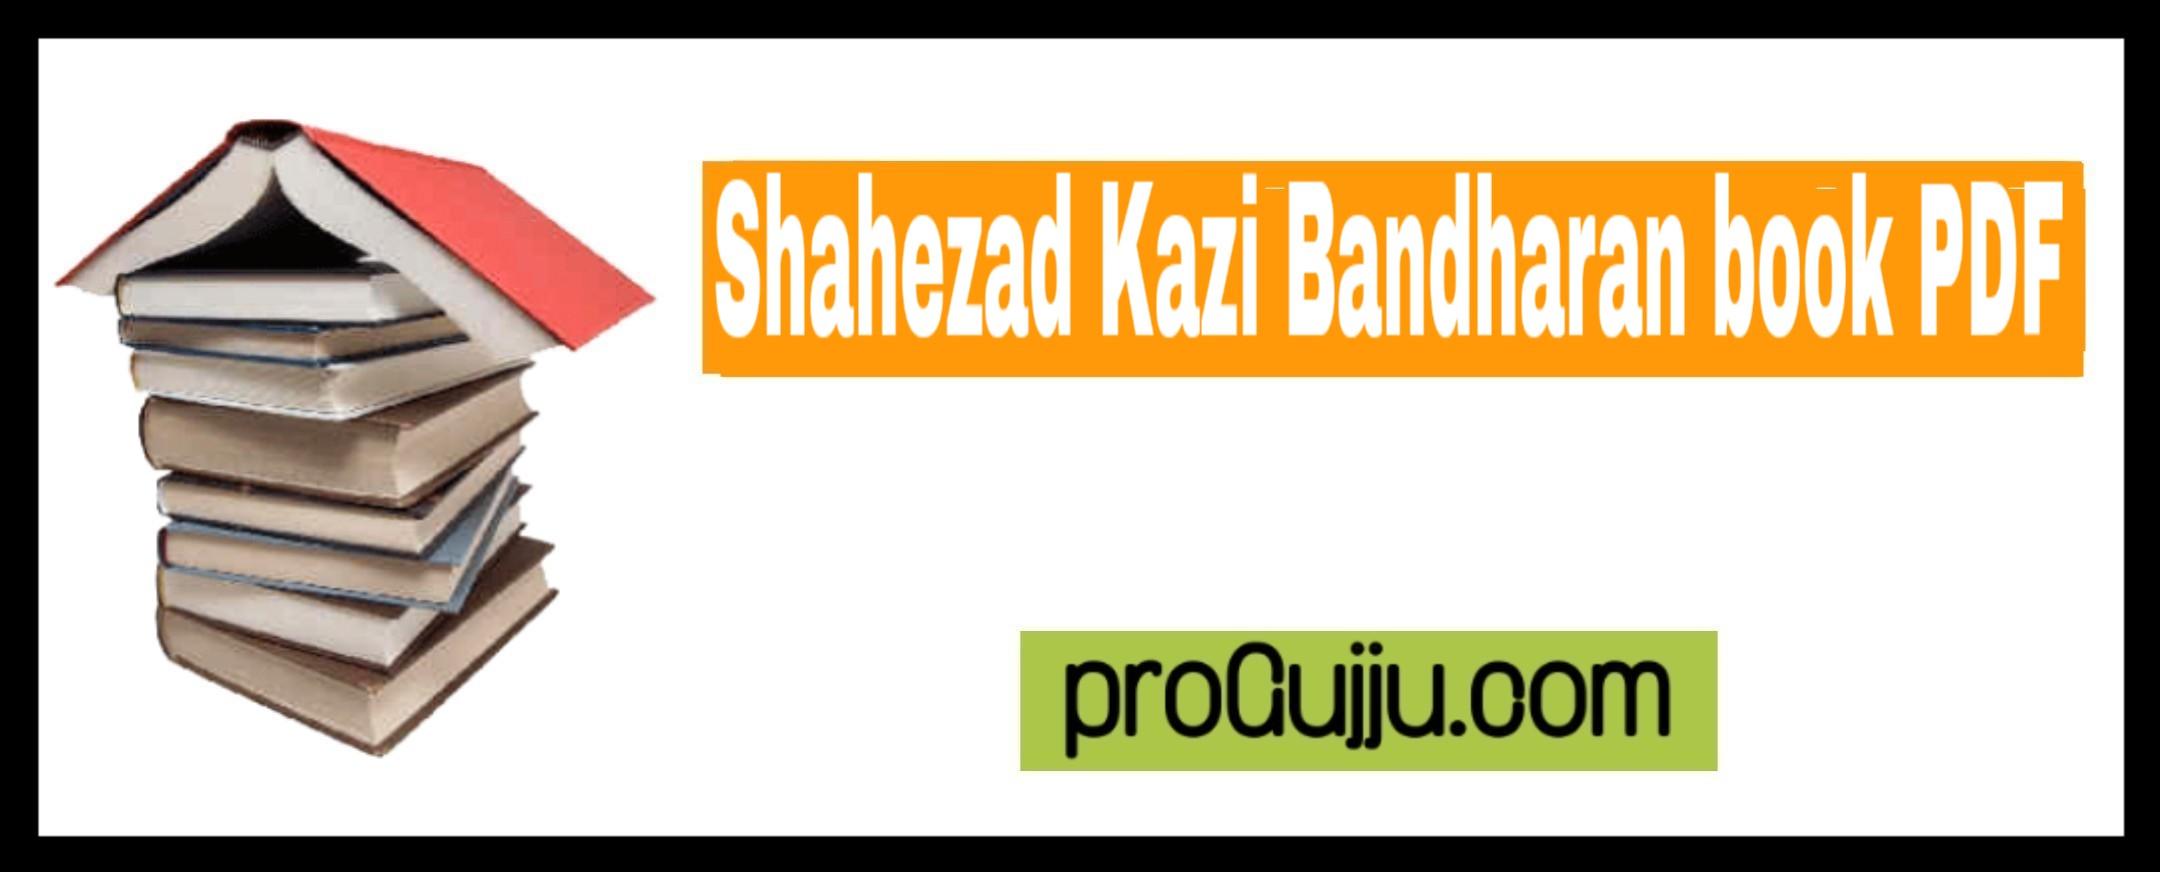 Shahezad kazi Bandharan Book PDF